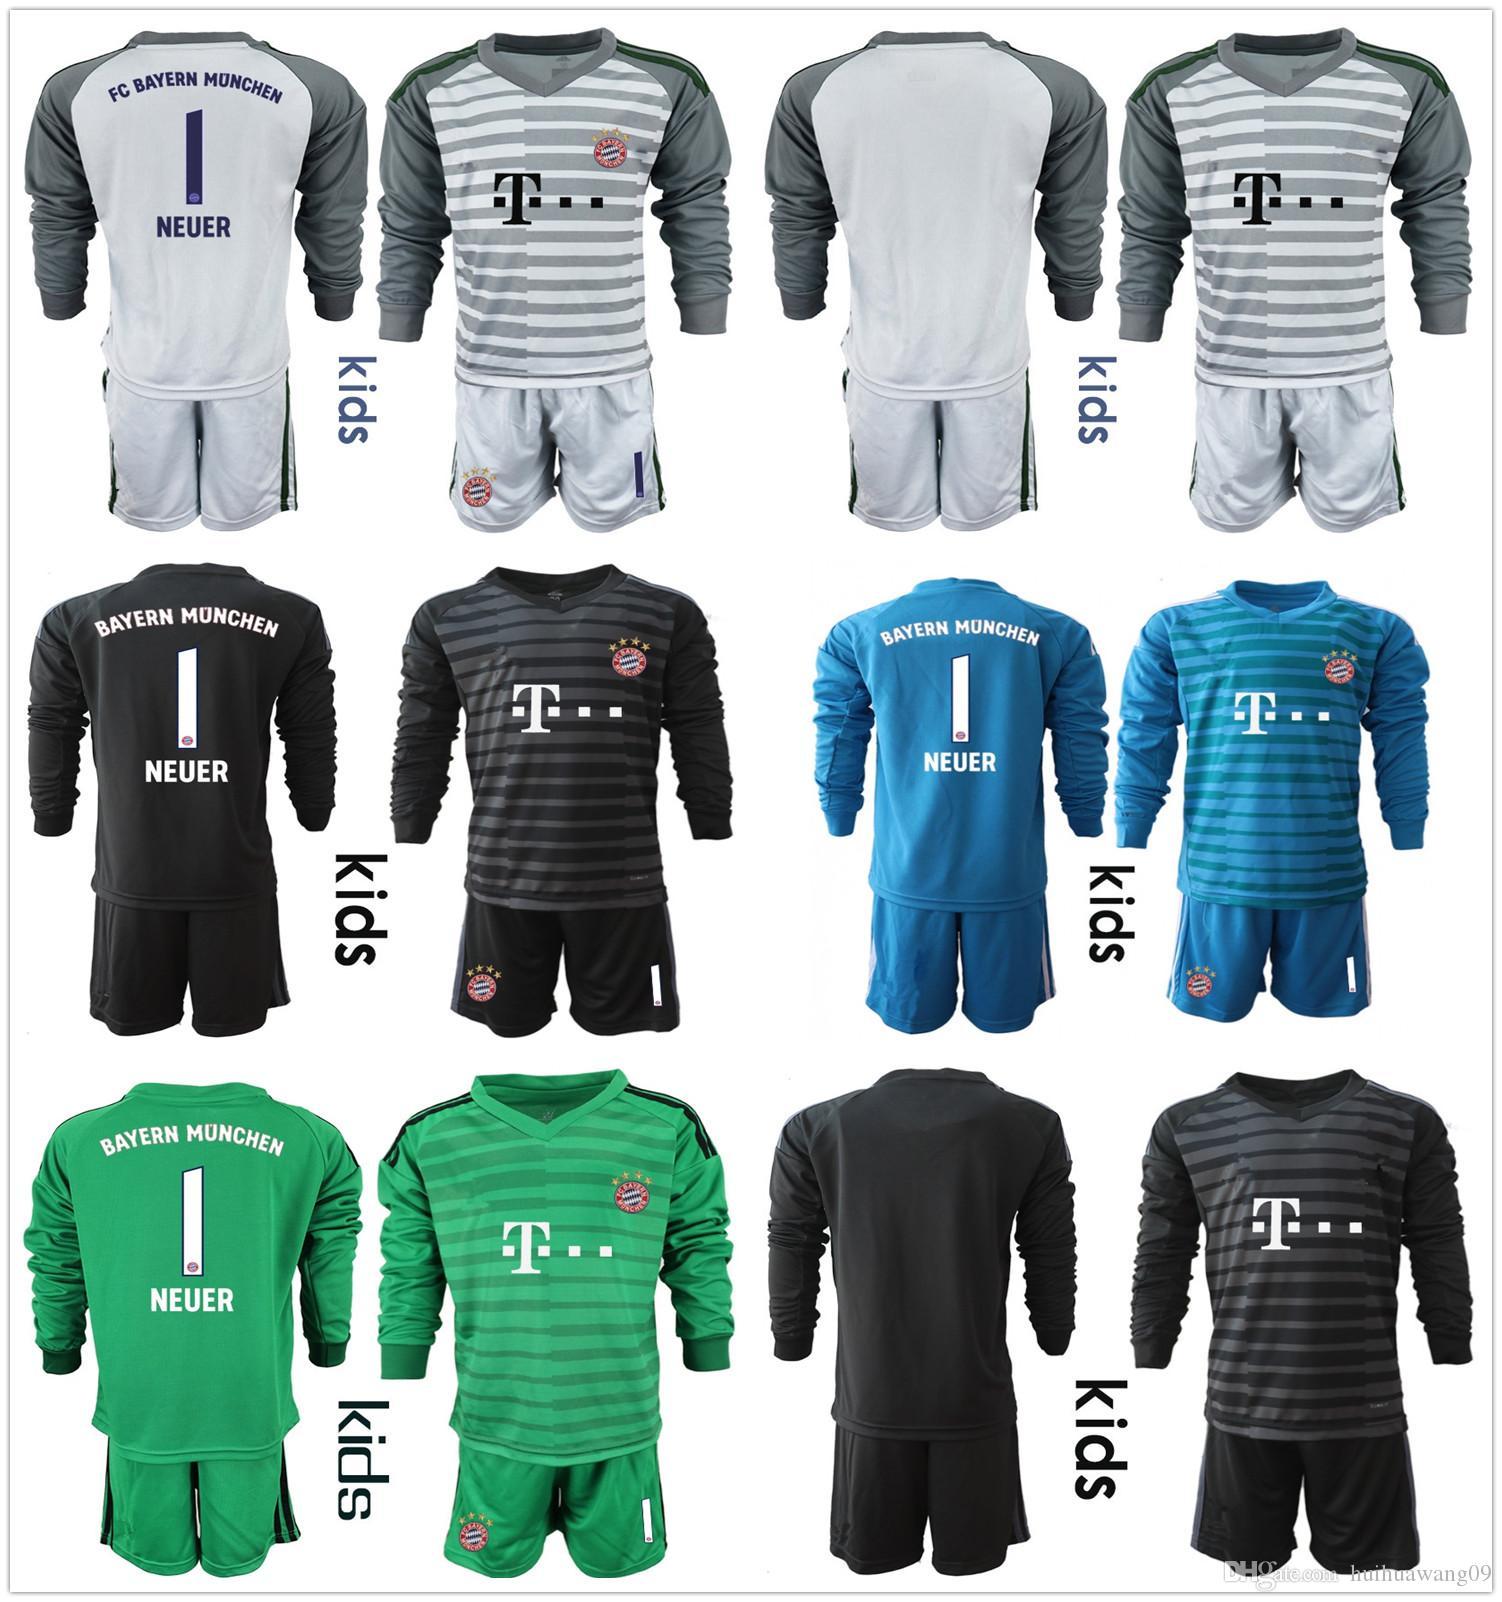 fa5aabe9469 2019 2018 2019 Kids Long Sleeve NEUER Goalkeeper Jersey Kit Youth Soccer  Sets #1 Manuel Neuer #26 Ulreich Hoffmann Football Kits KID Full Uniform  From ...